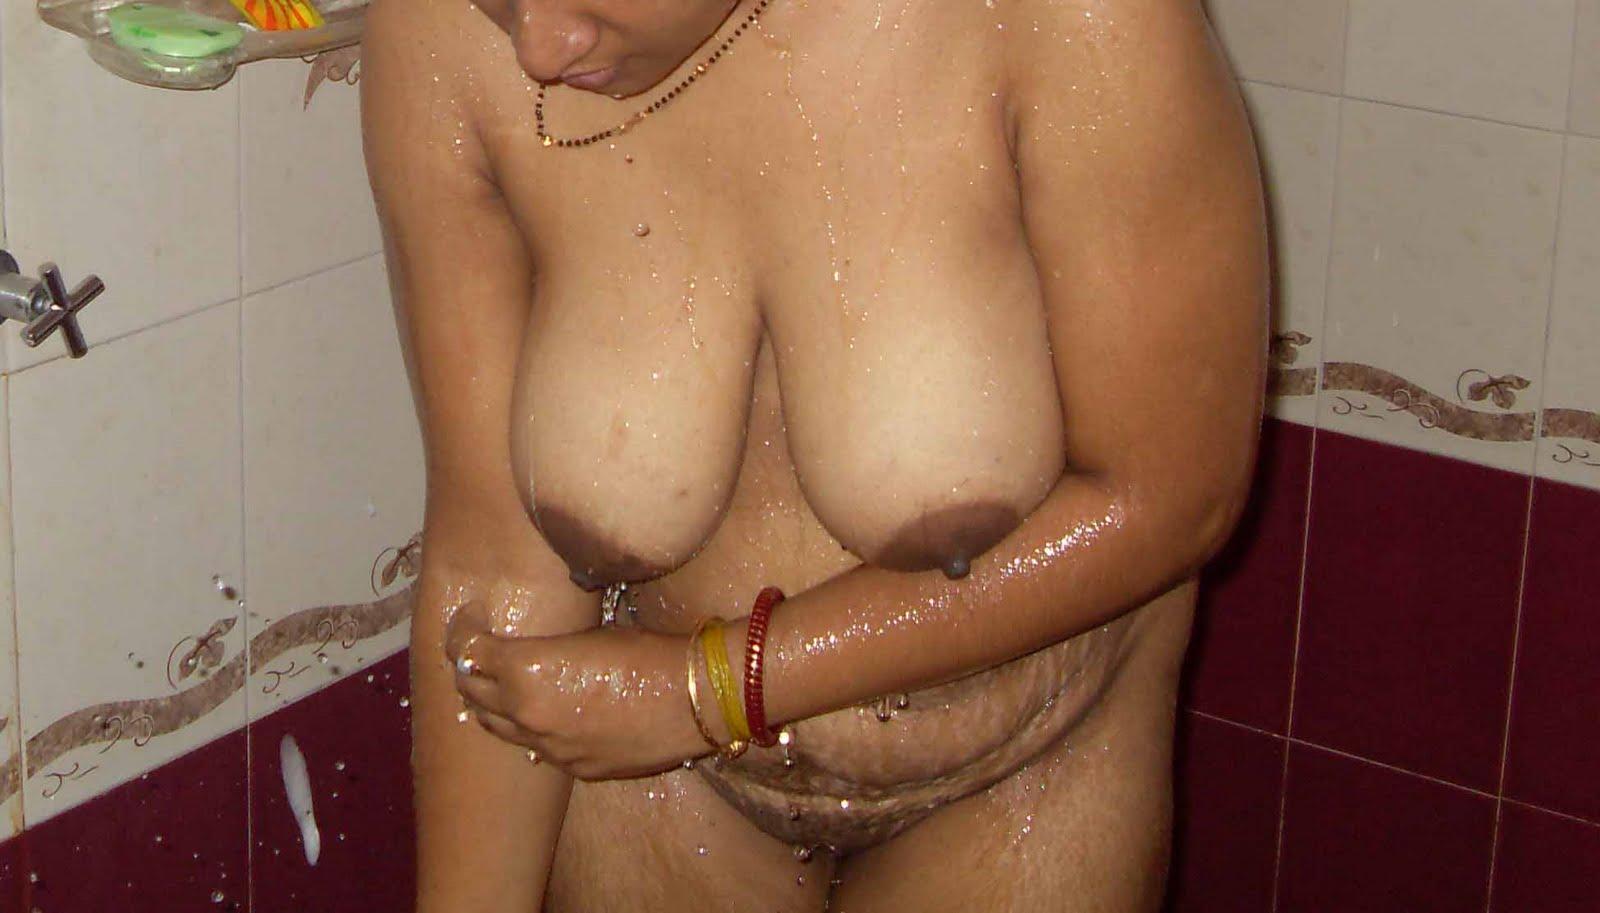 Andhra aunty blowjob and saree strip - 5 3